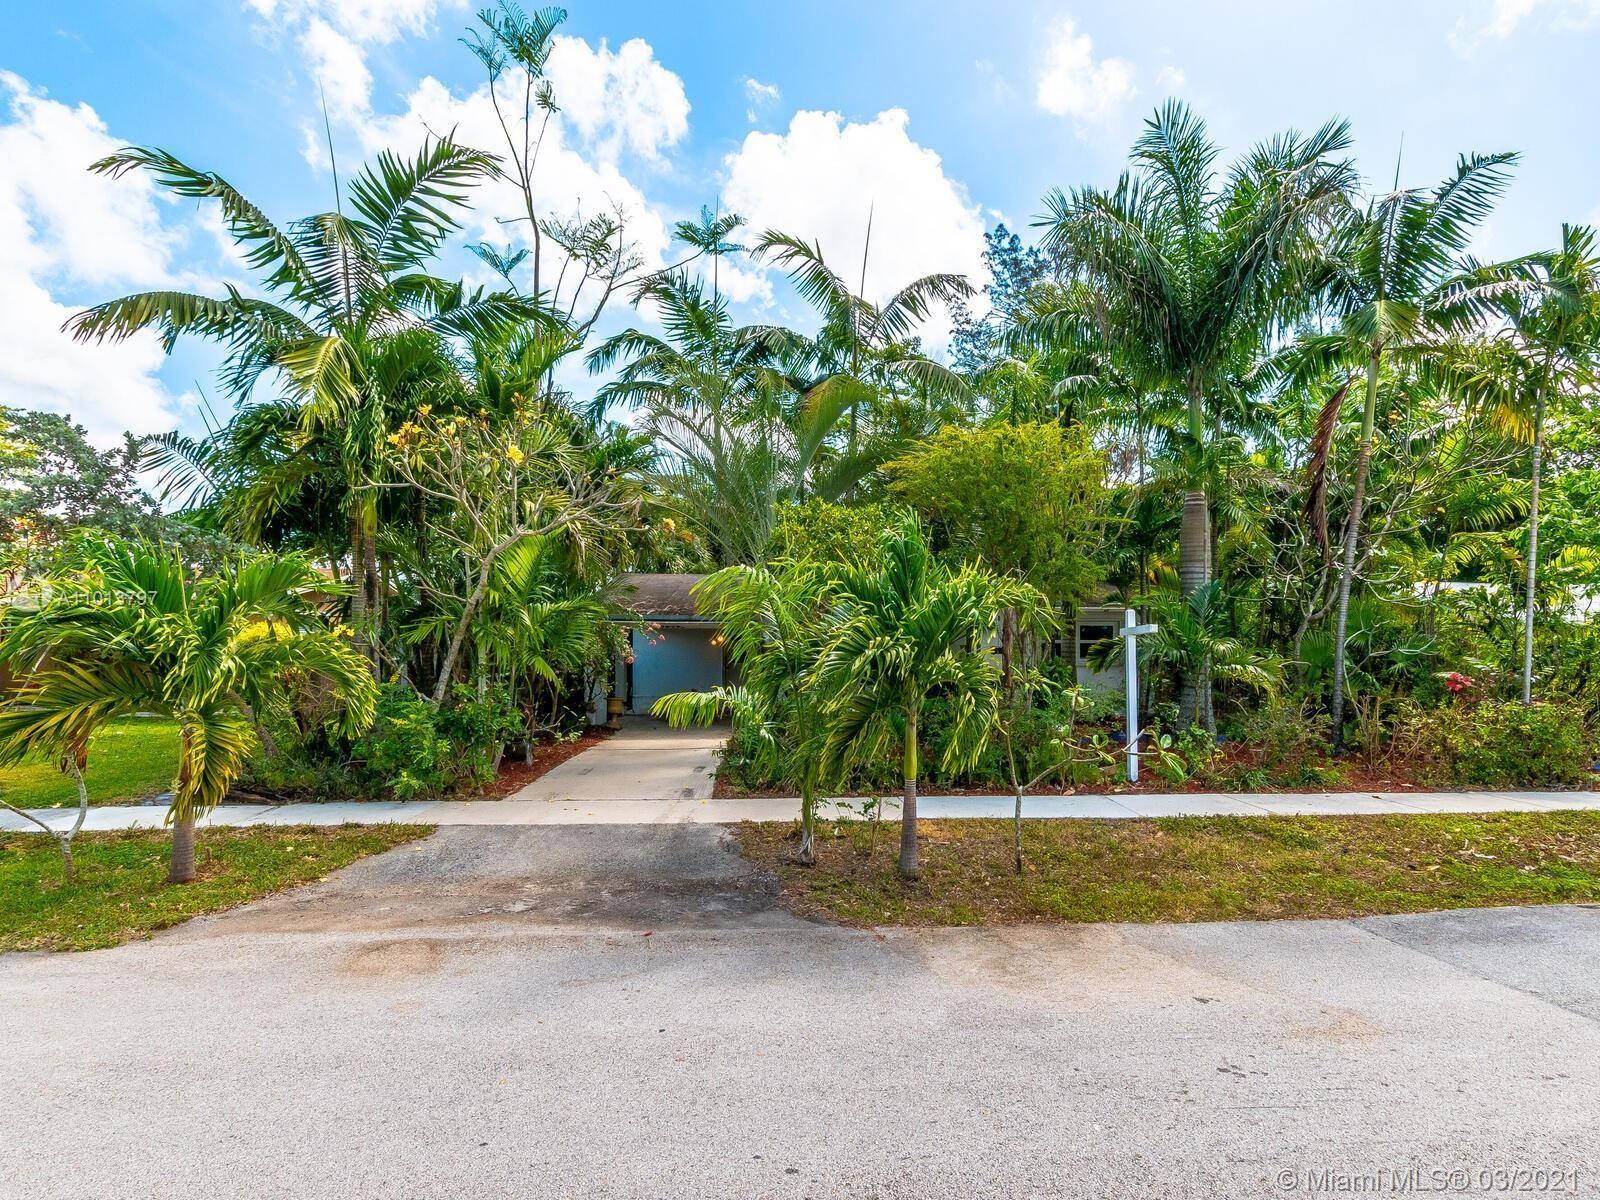 Photo of 4540 SW 34th Ave, Dania Beach, FL 33312 (MLS # A11013797)